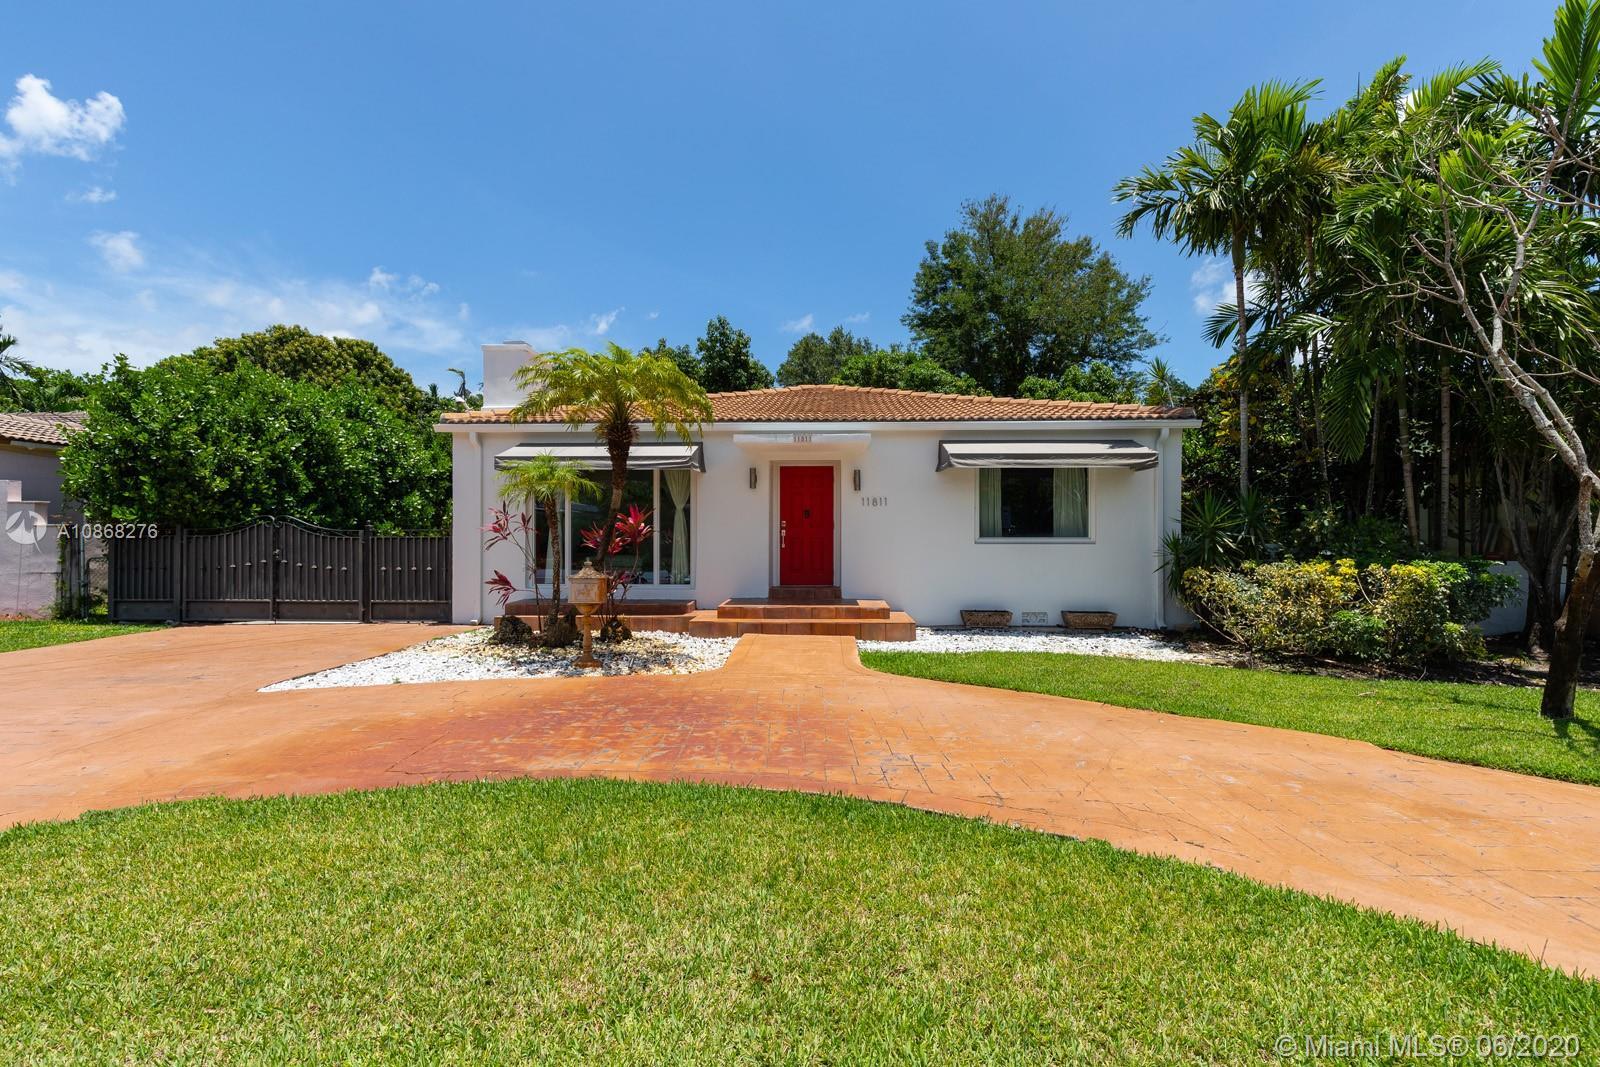 11811 NE 6th Ave Property Photo - Biscayne Park, FL real estate listing